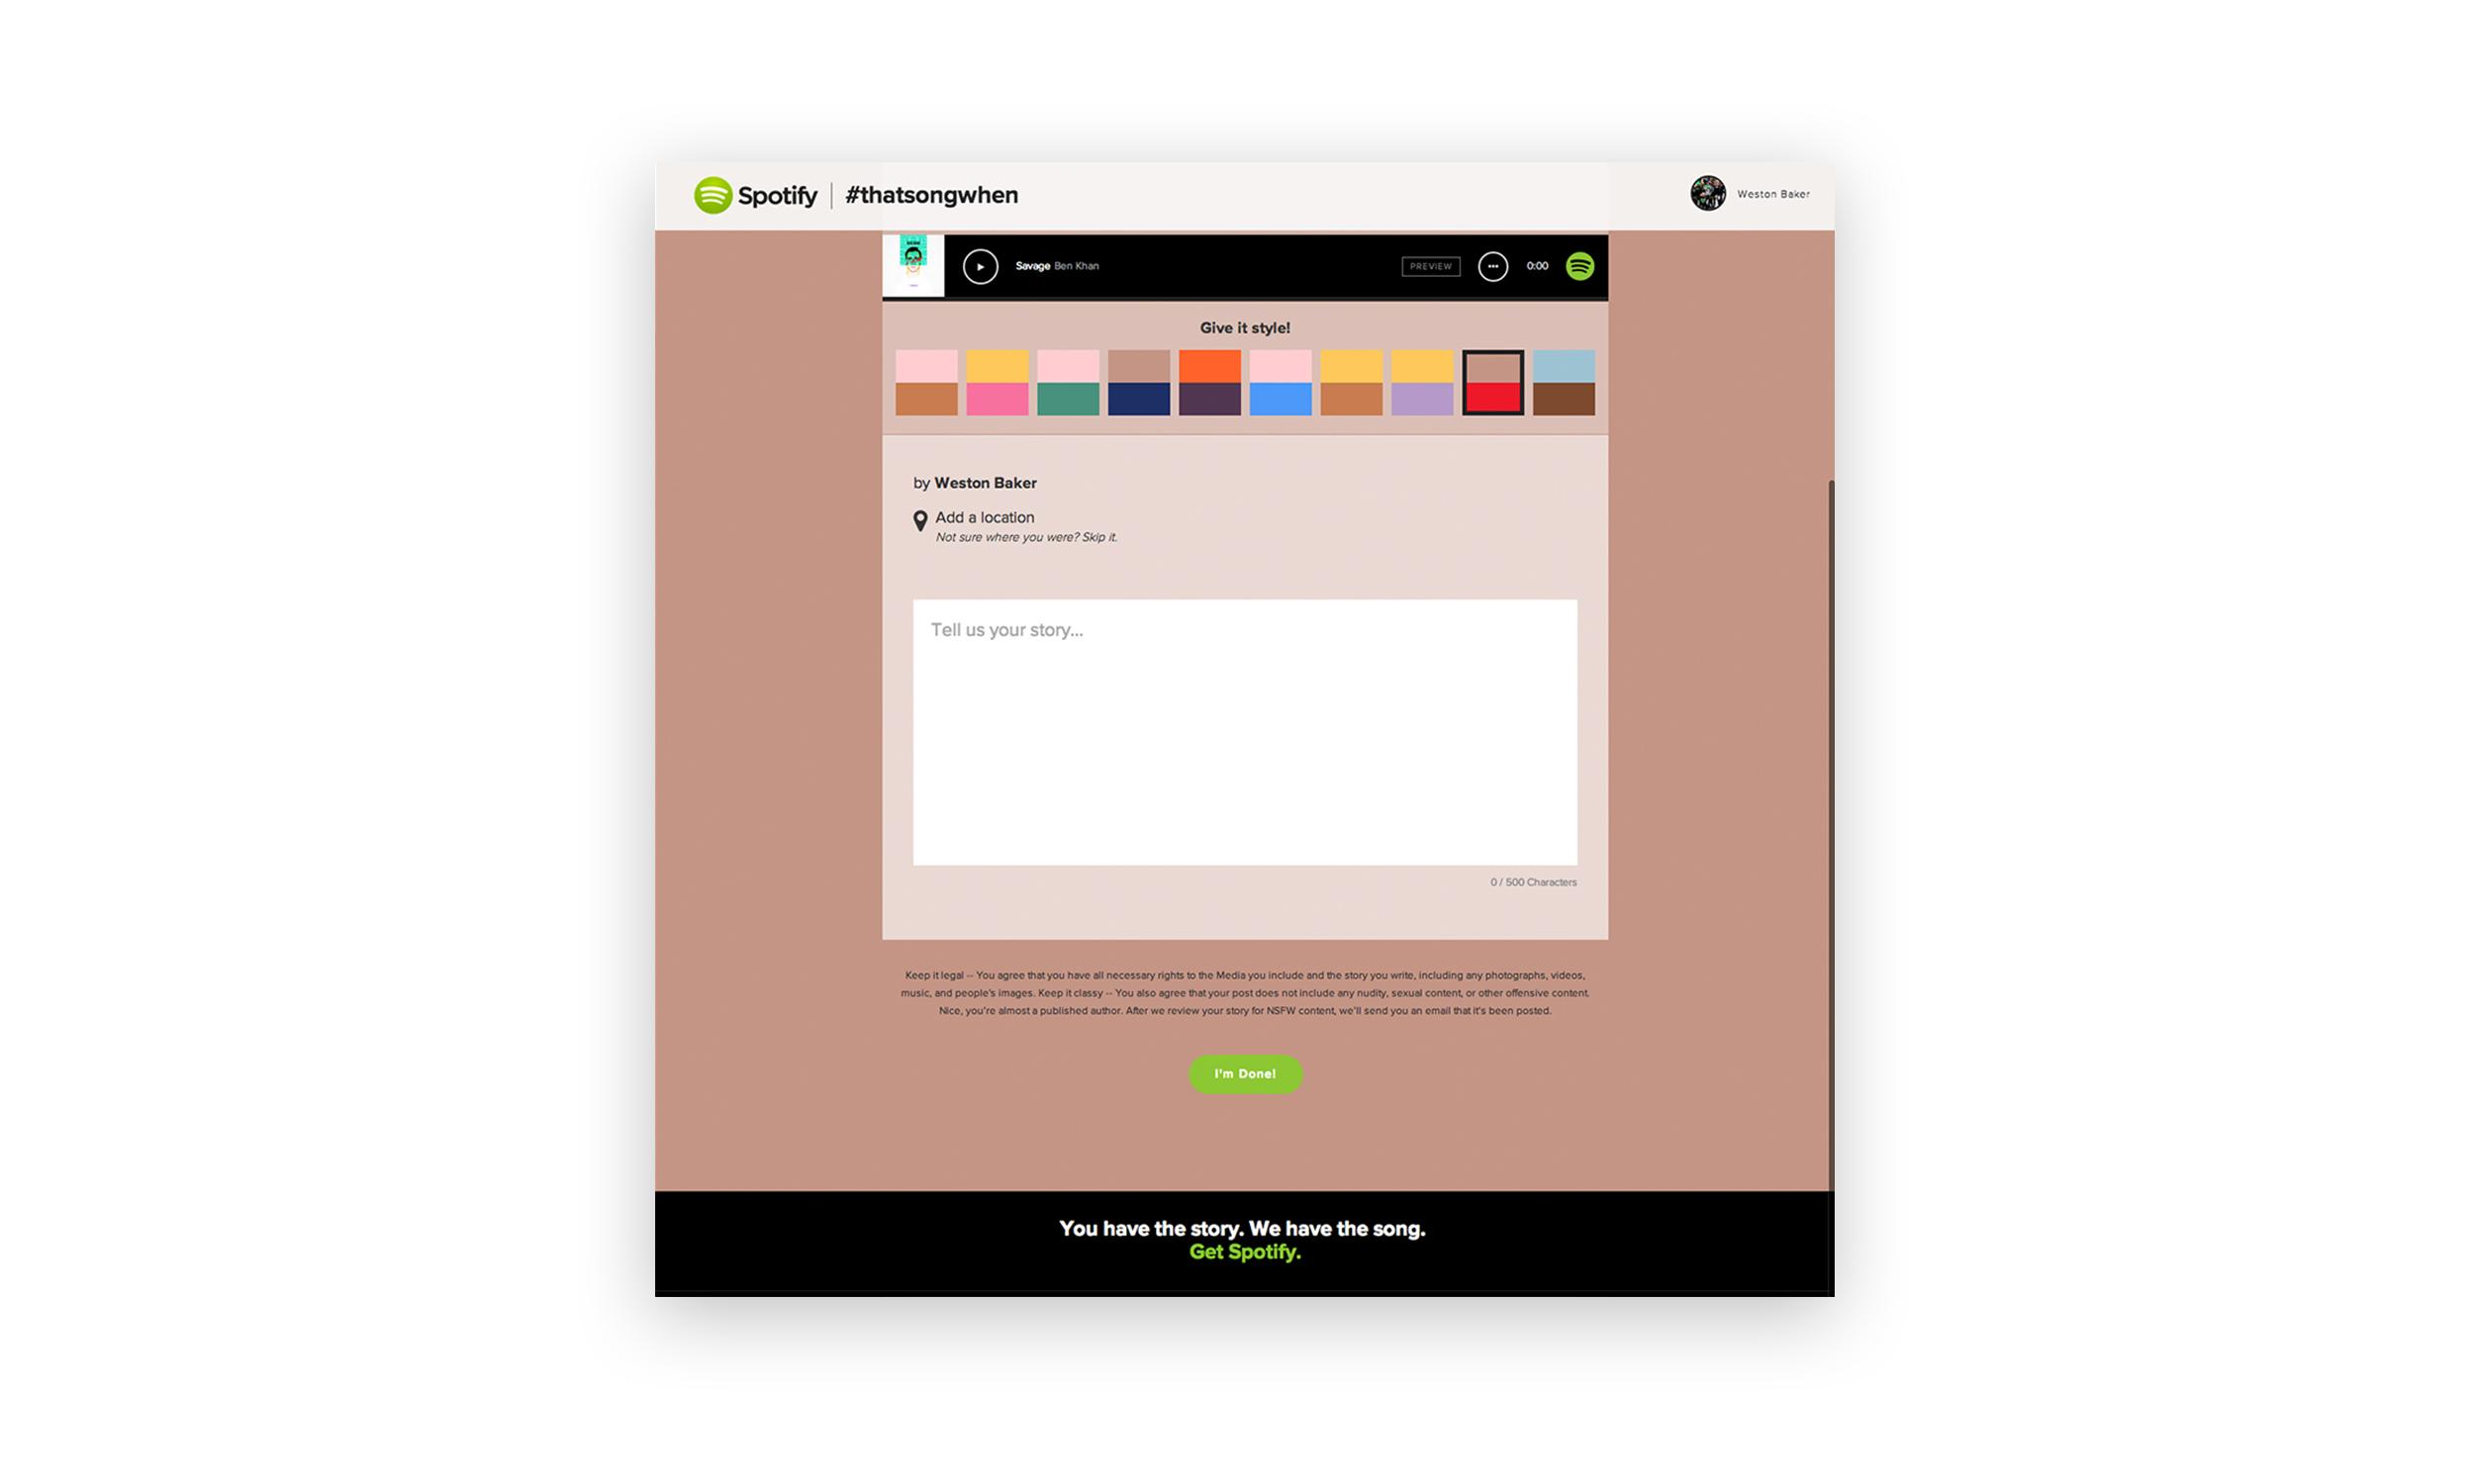 Spotify-thatsongwhen-screens7.jpg